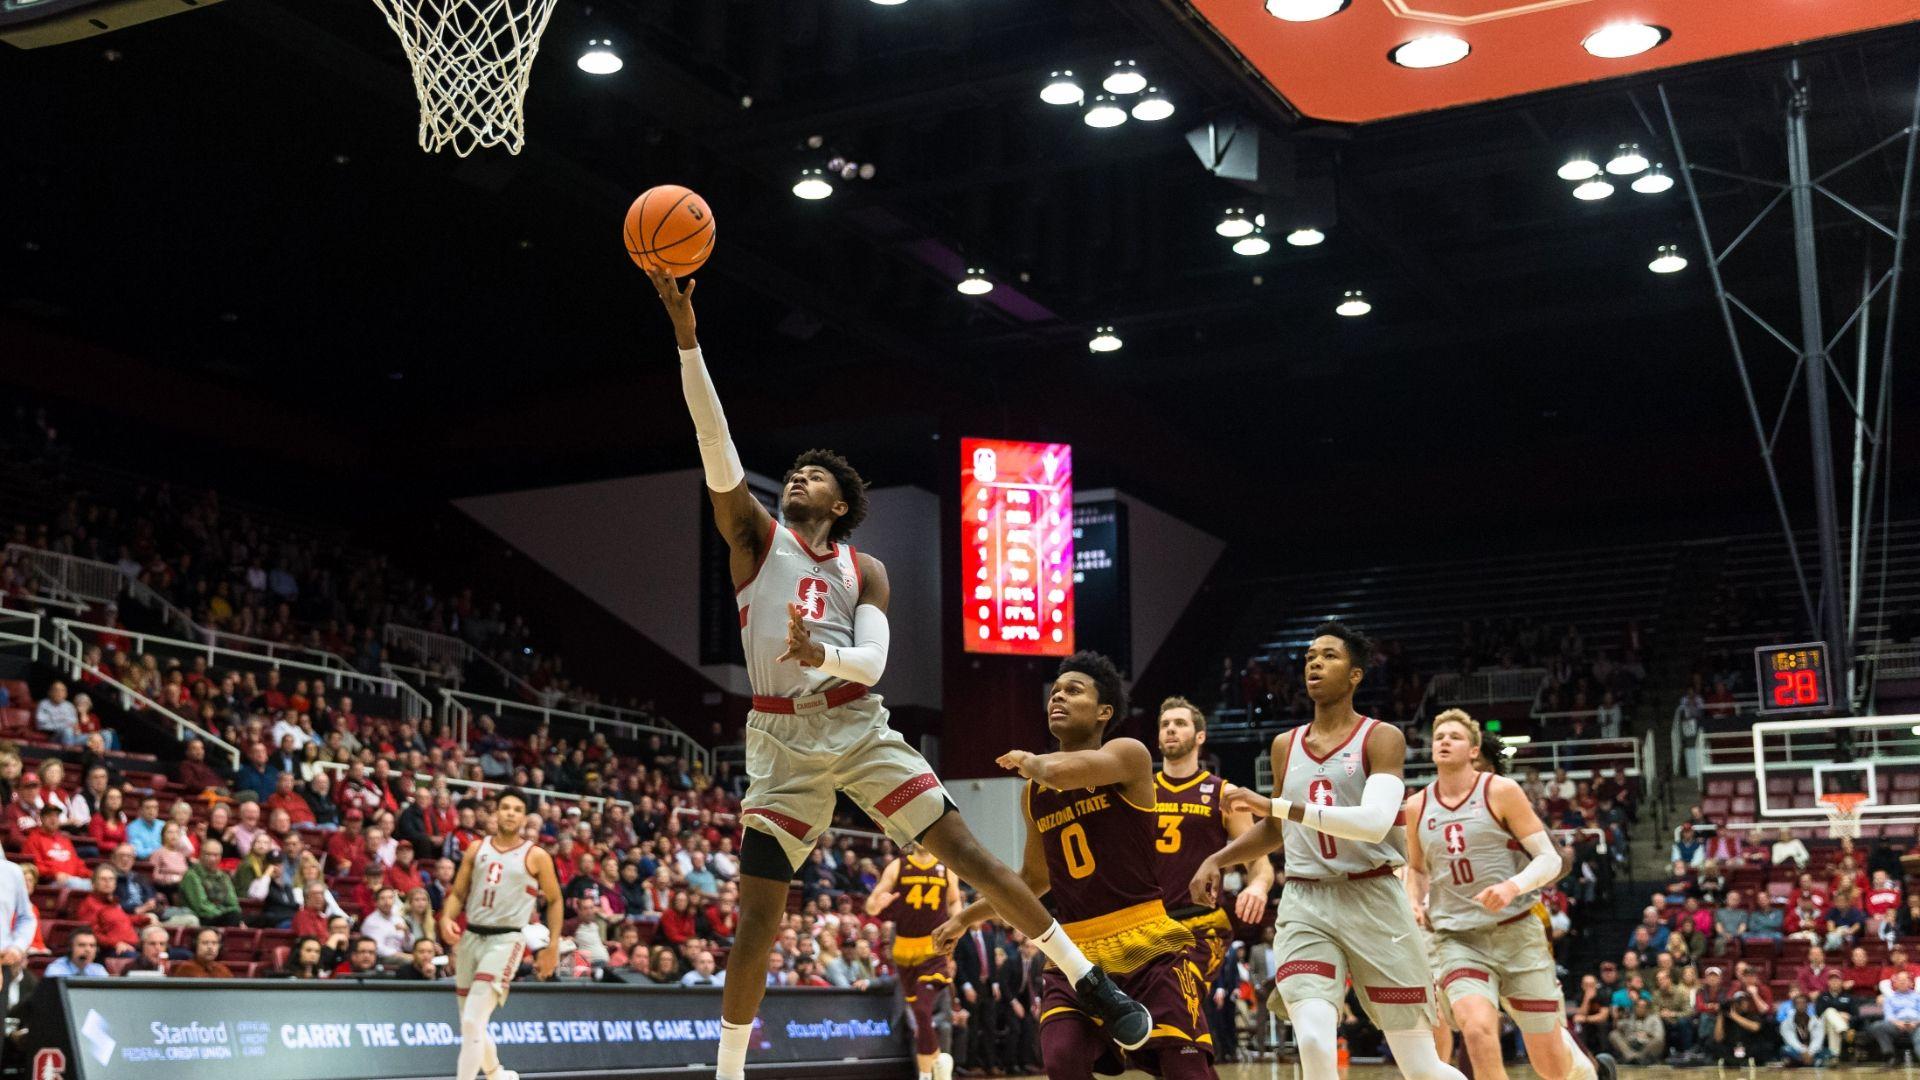 Stanford upsets No. 16 ASU